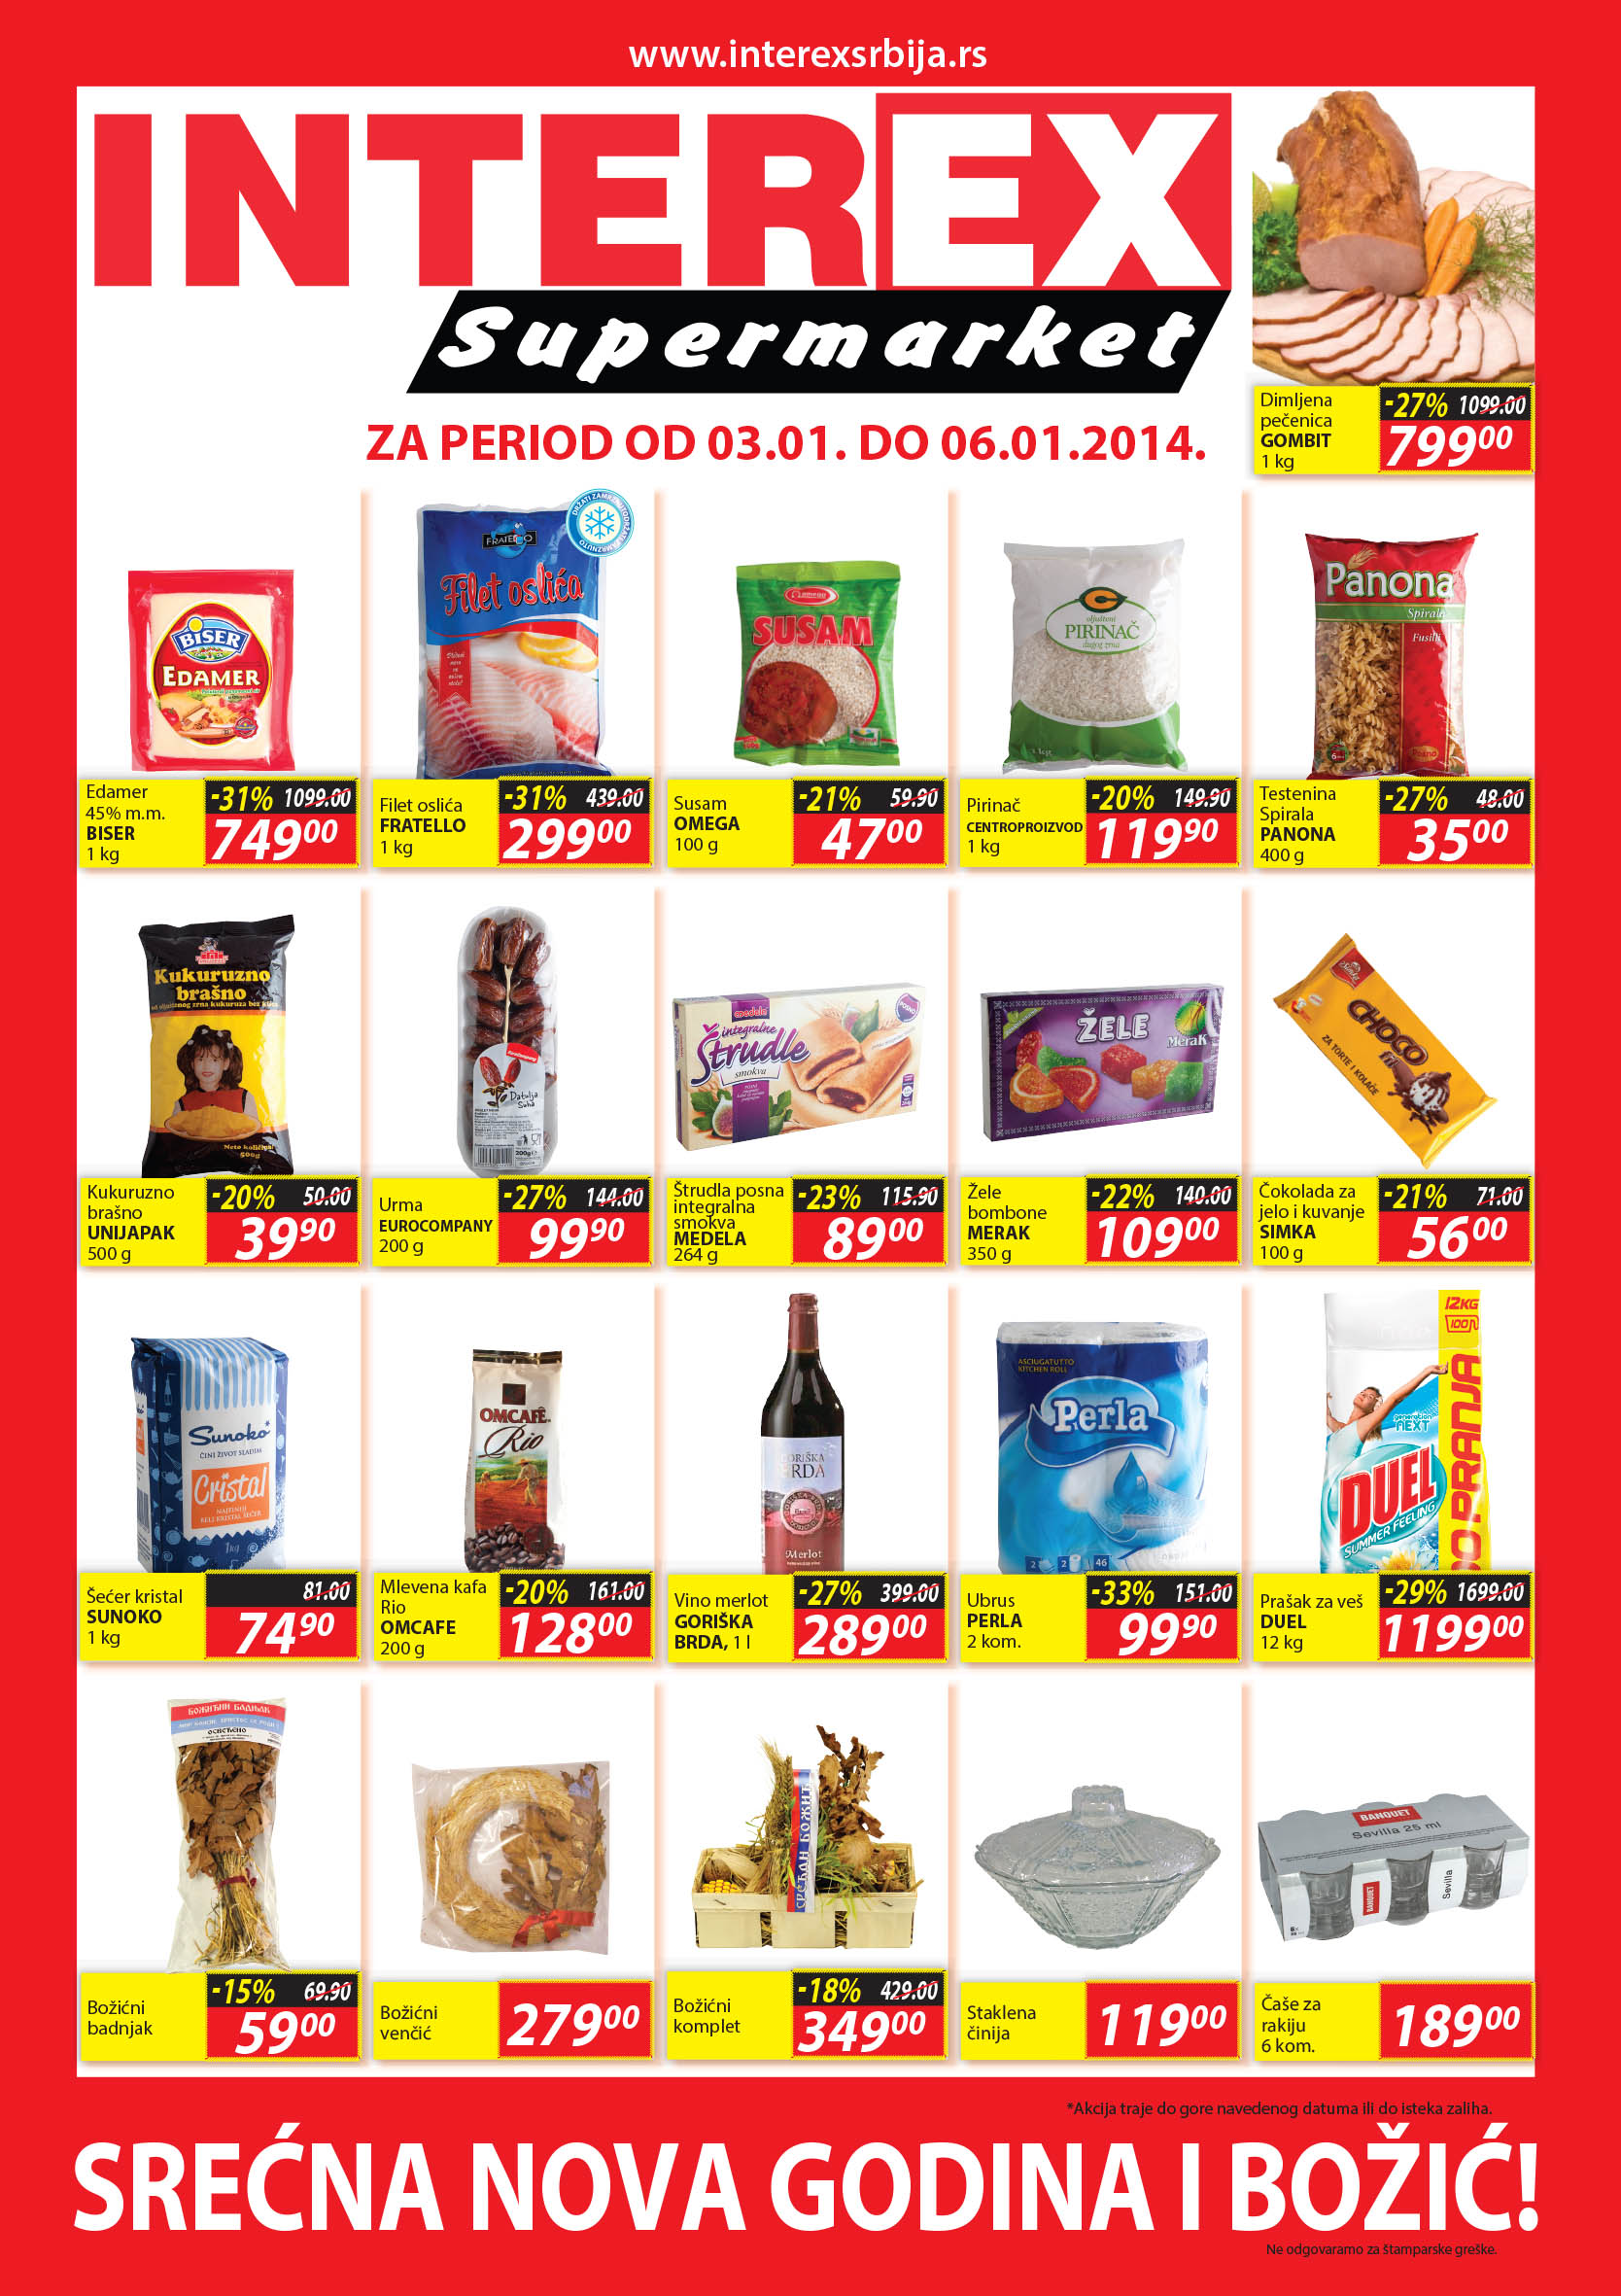 Interex katalog božićne ponude